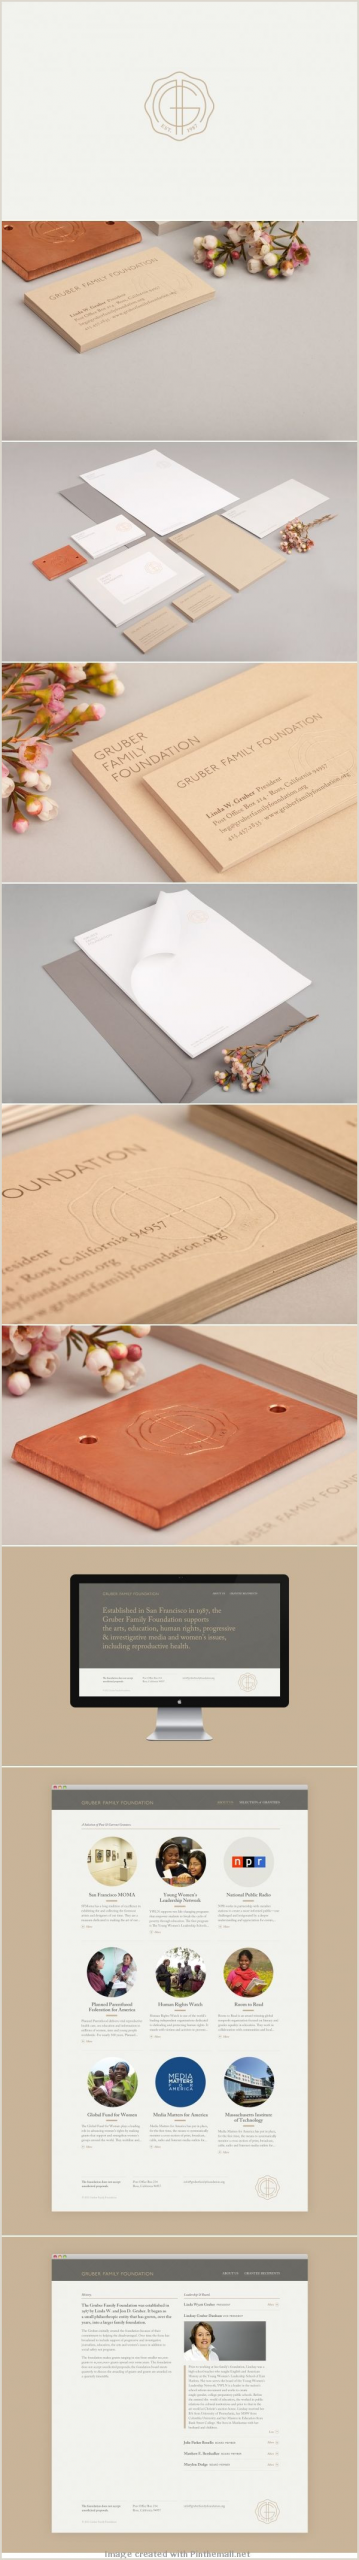 Visting Card Template 14 Popular Hardwood Flooring Business Card Template